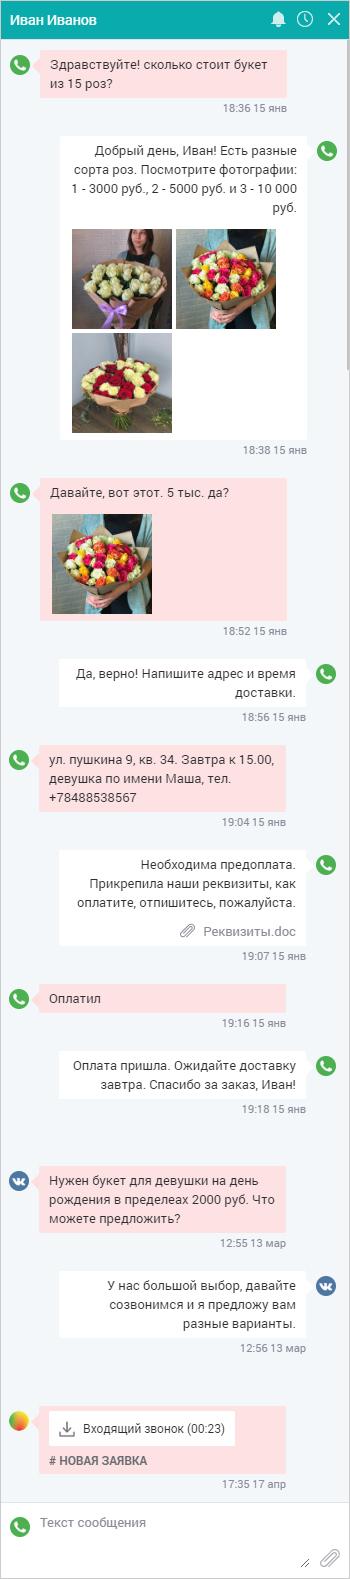 Итог: единая система учета заявок